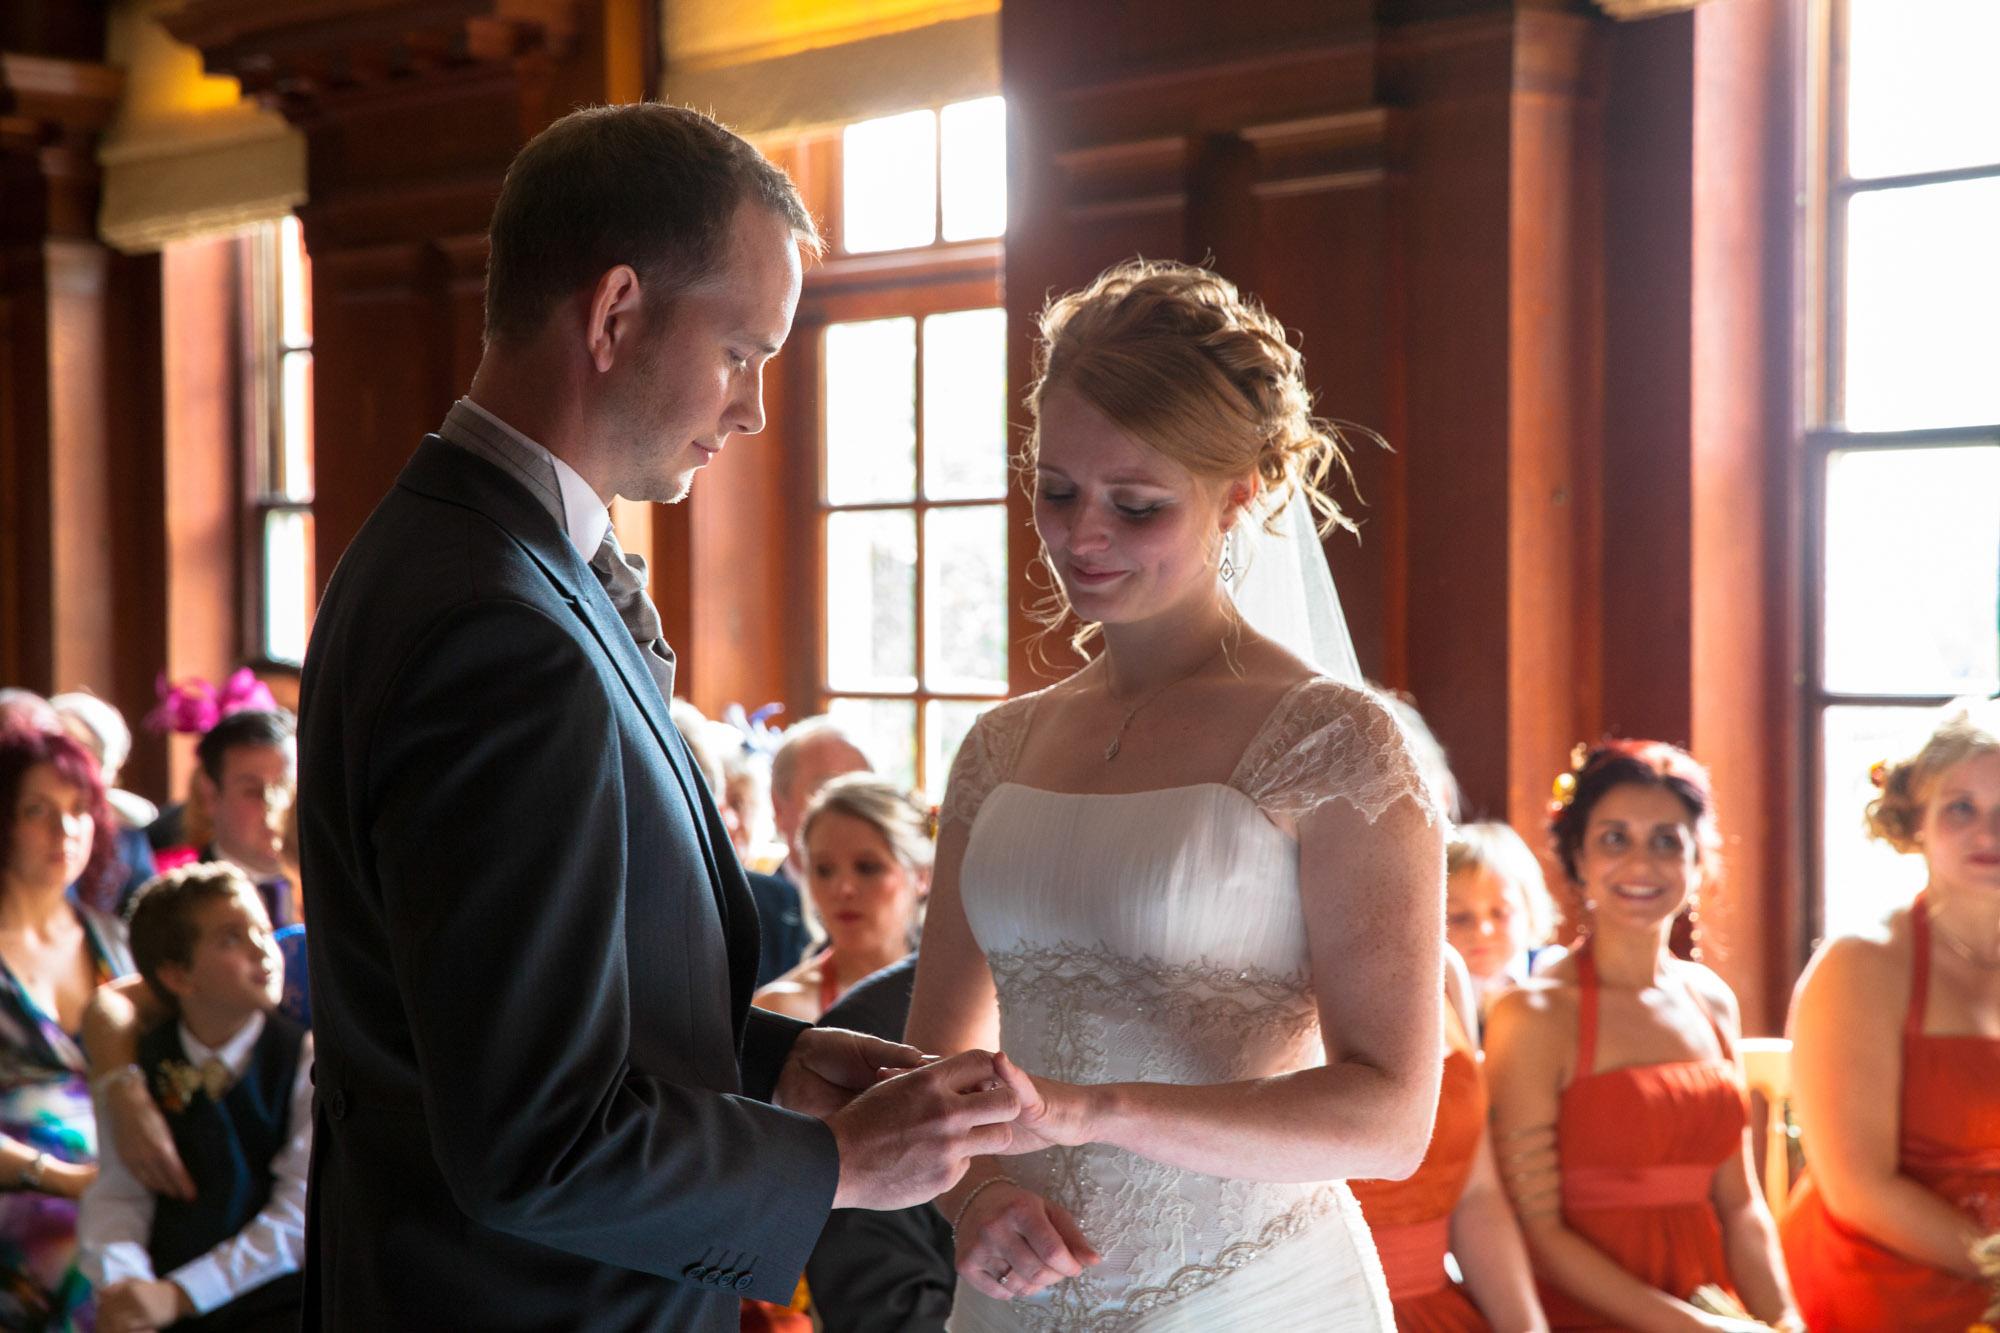 weddings-couples-love-photographer-oxford-london-jonathan-self-photography-33.jpg